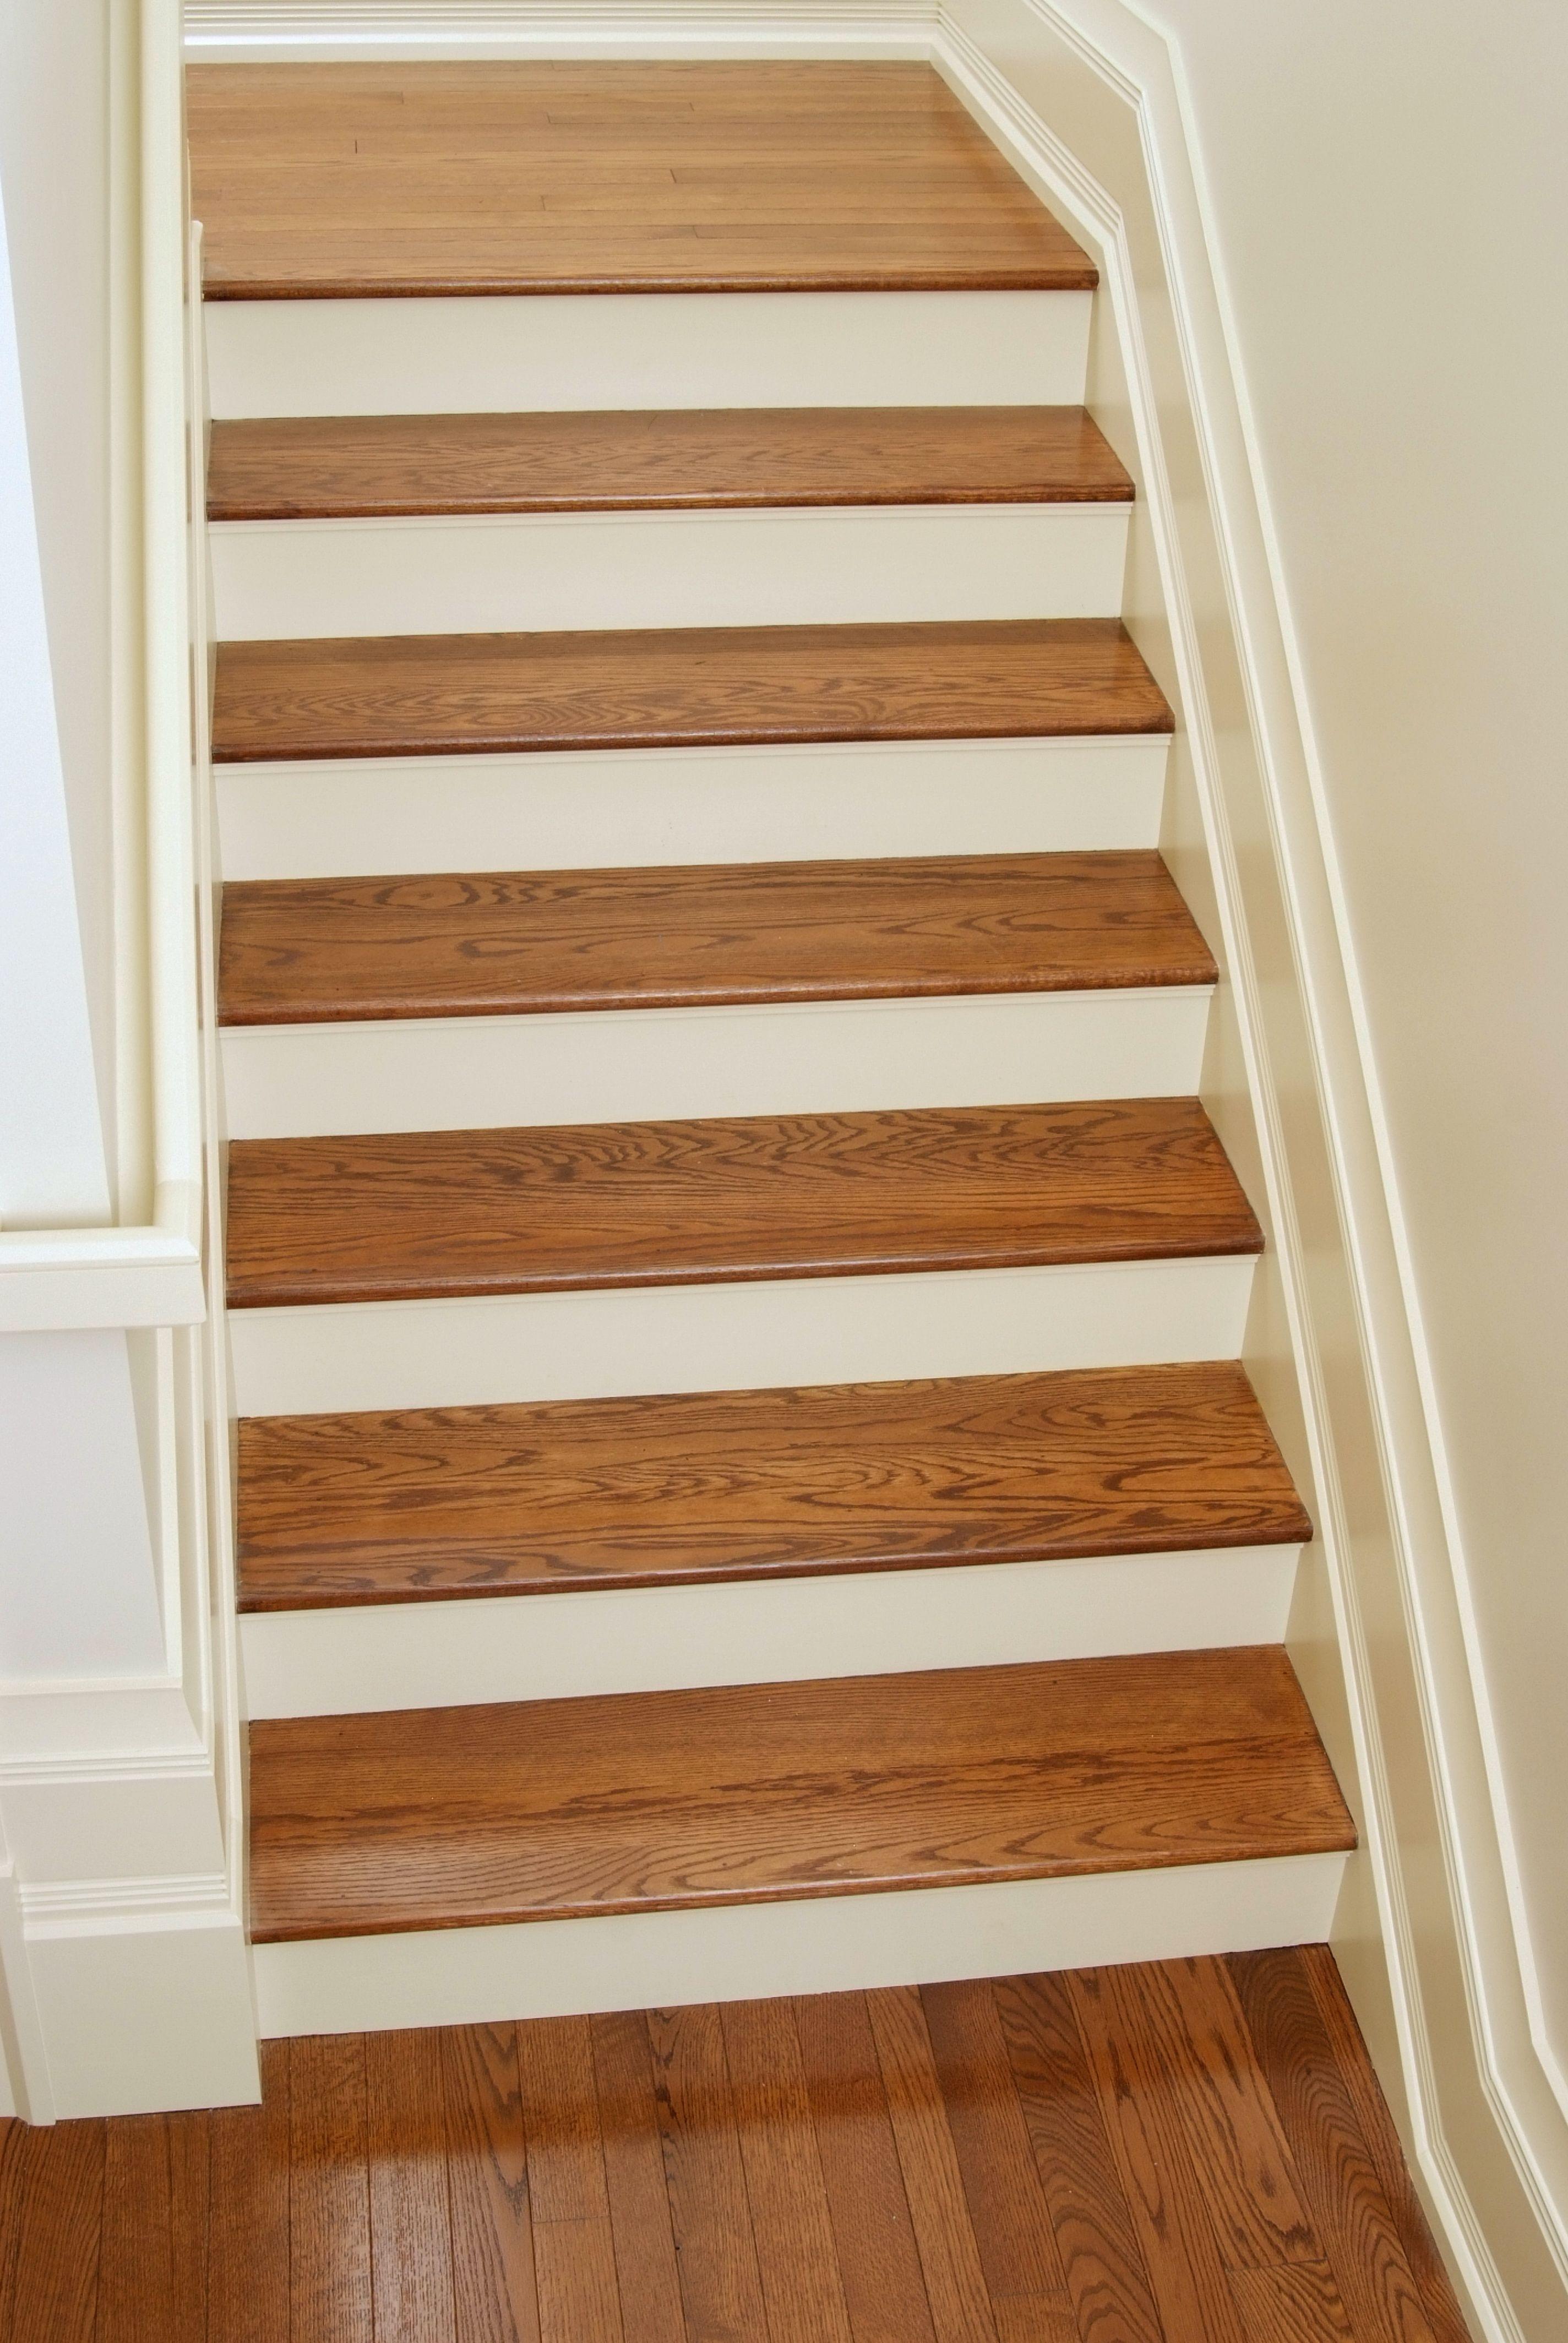 Best White Oak Stair Treads In 2019 Wood Stairs Wood Stair 400 x 300